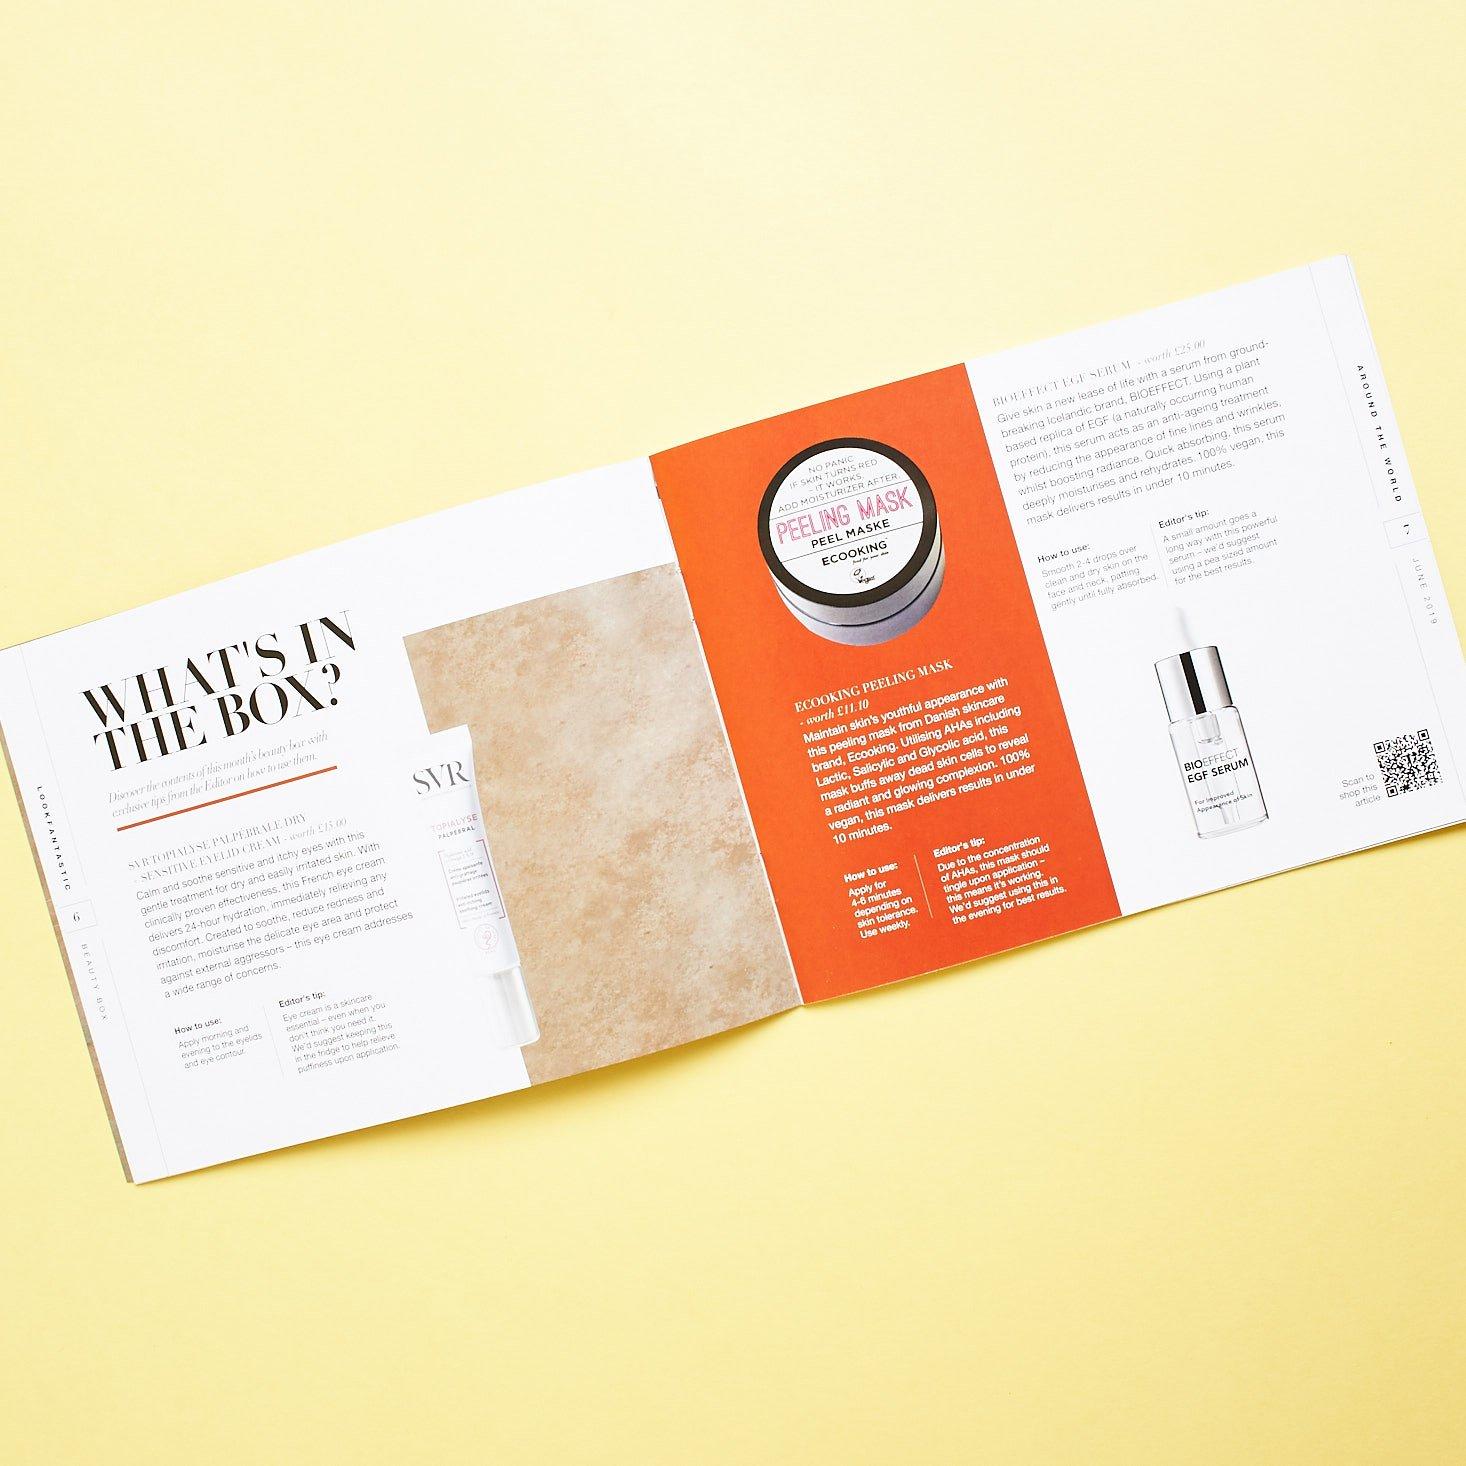 Look Fantastic June 2019 beauty box review booklet